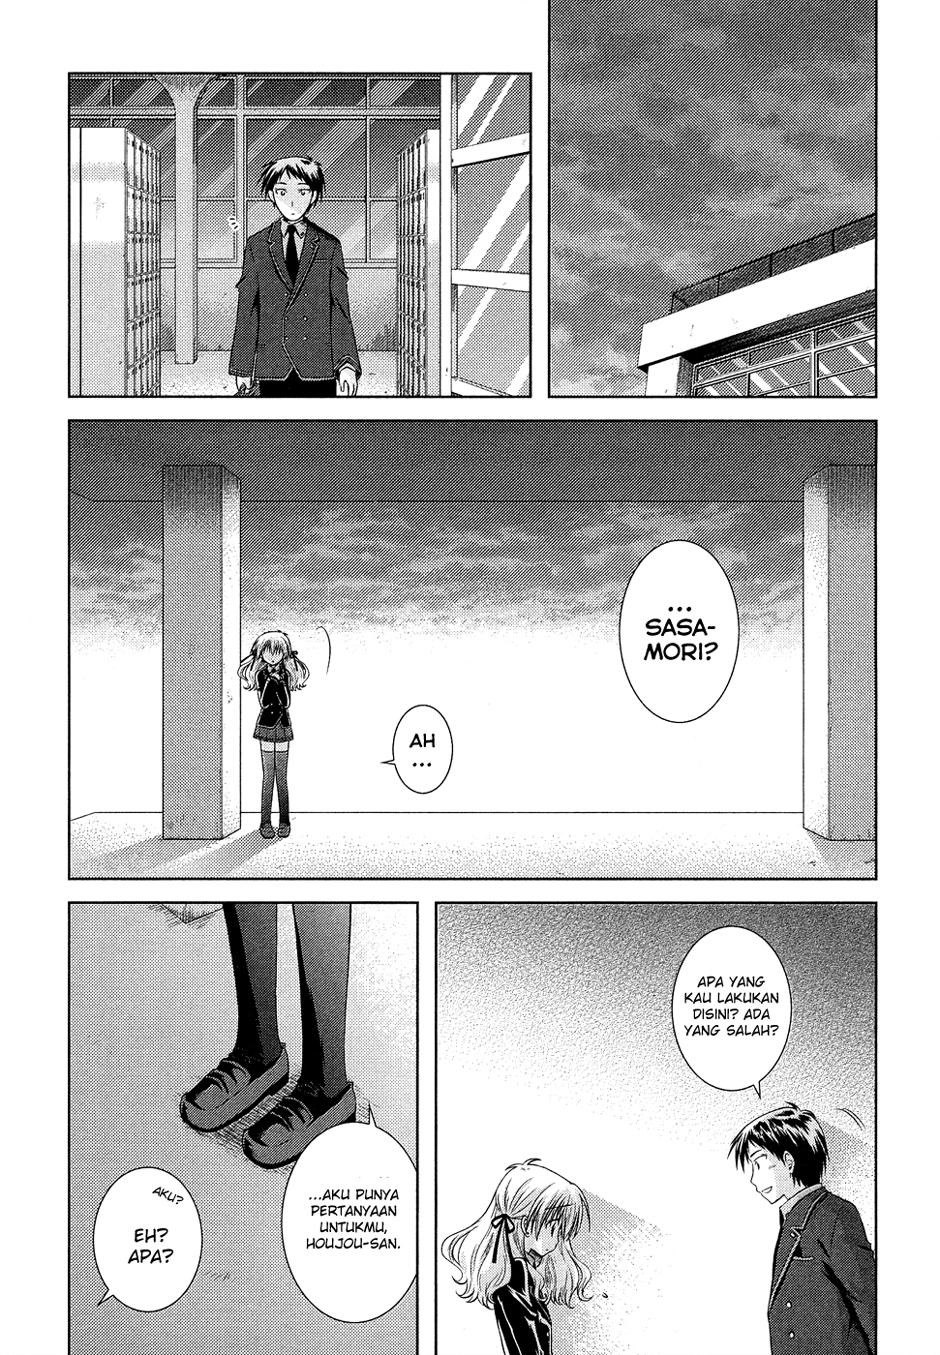 Komik iris zero 011 12 Indonesia iris zero 011 Terbaru 20|Baca Manga Komik Indonesia|